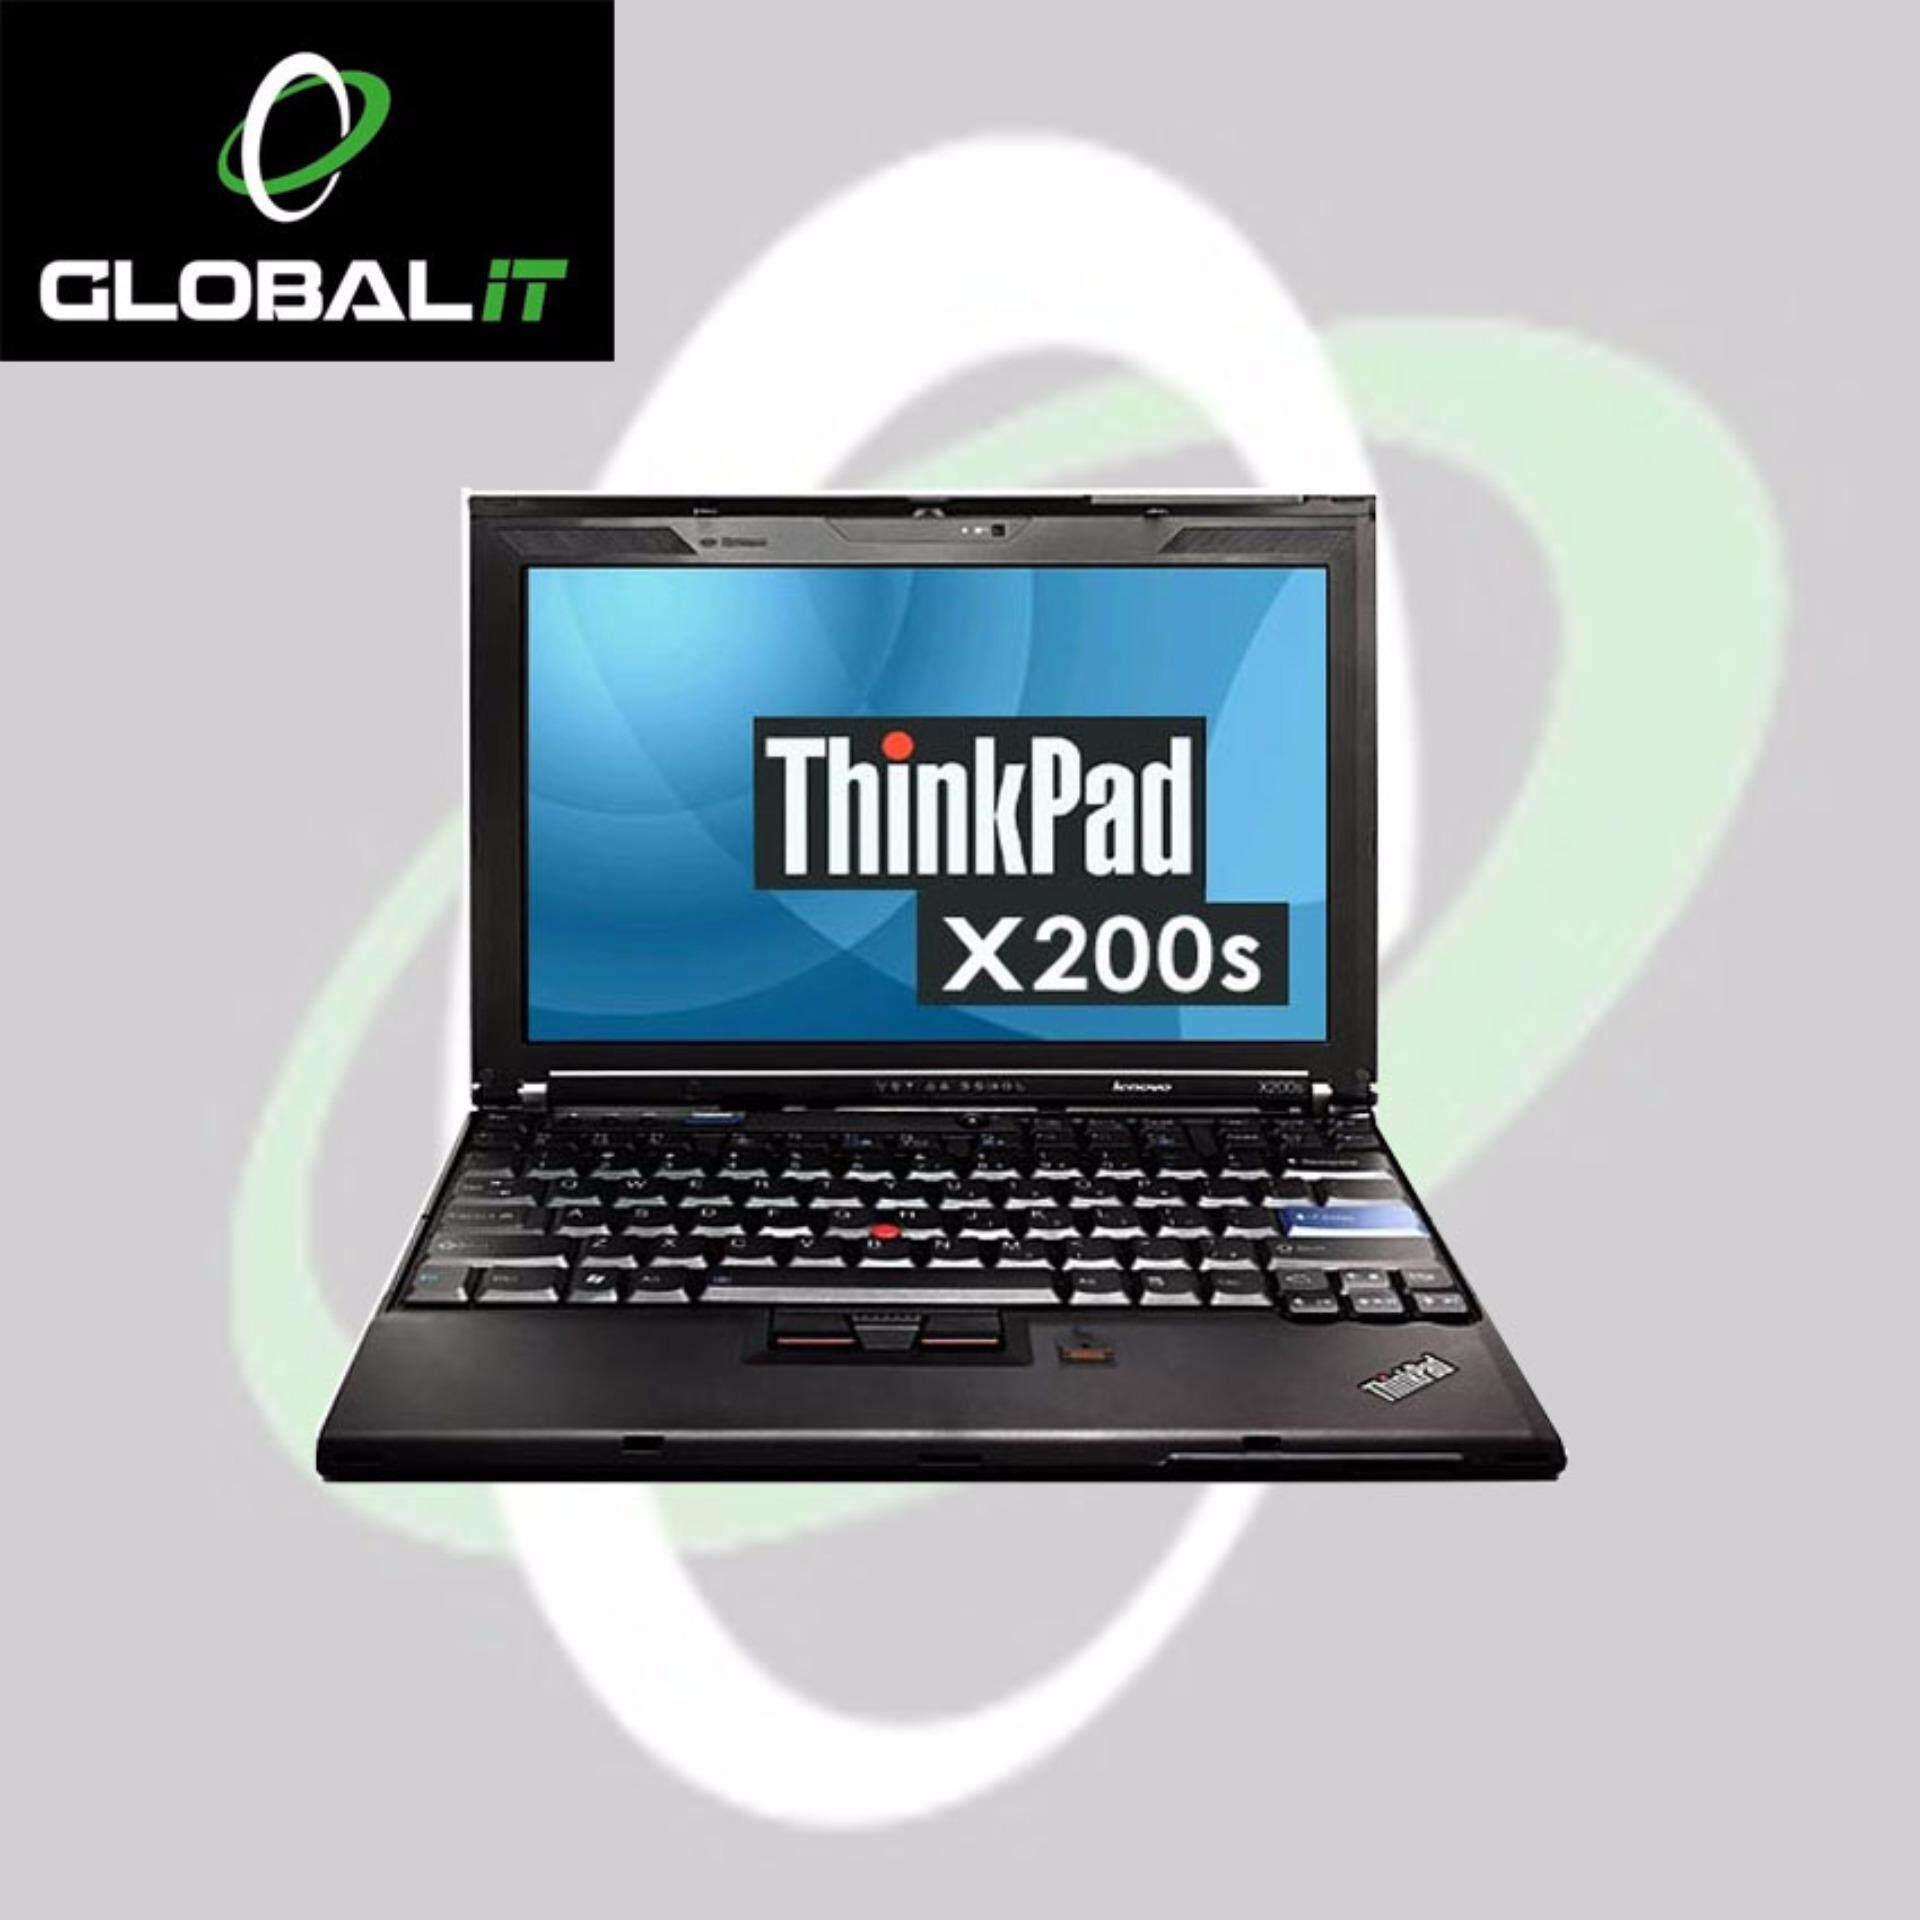 REFURBISHED LENOVO THINKPAD X200, ORIGINAL WIN 7 PRO   INTEL CORE 2 DUO   2 GB RAM  160 GB HDD  INTEL GRAPHIC VIDEO  12.5 INCH Malaysia